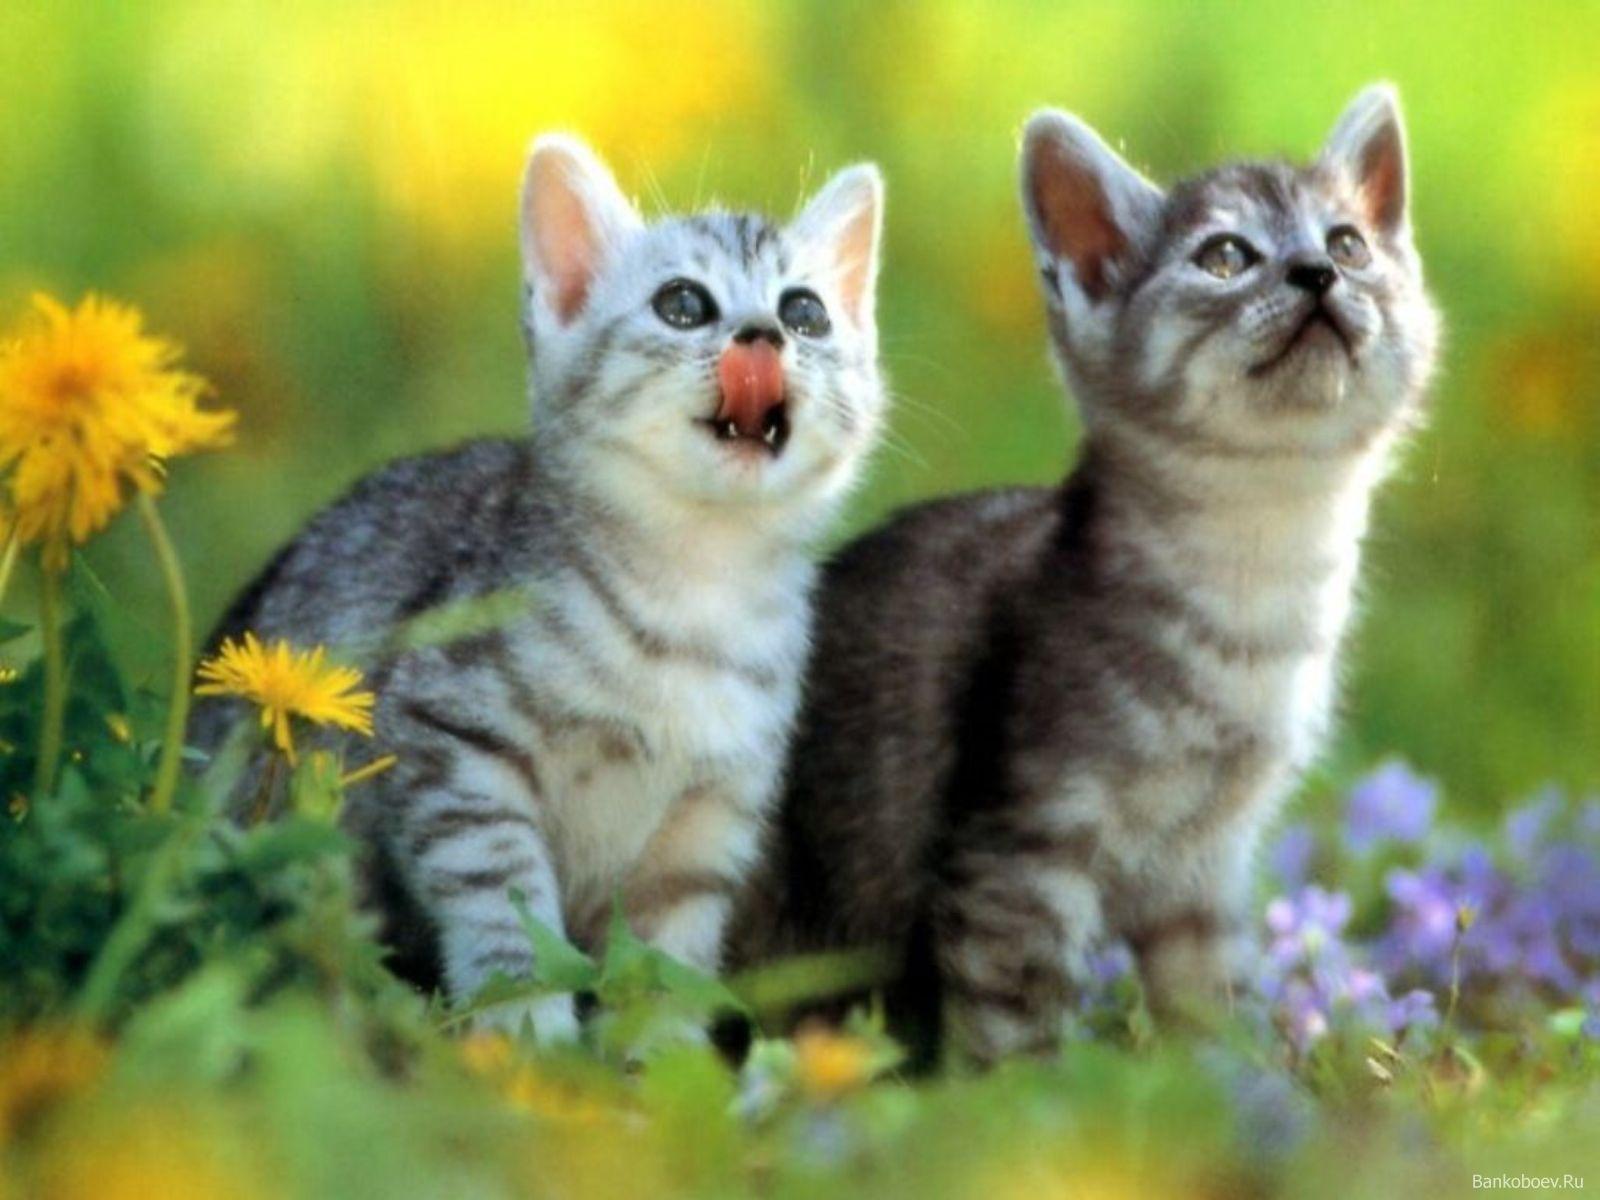 посмотреть картинки про кошек 9. посмотреть картинки про кошек.